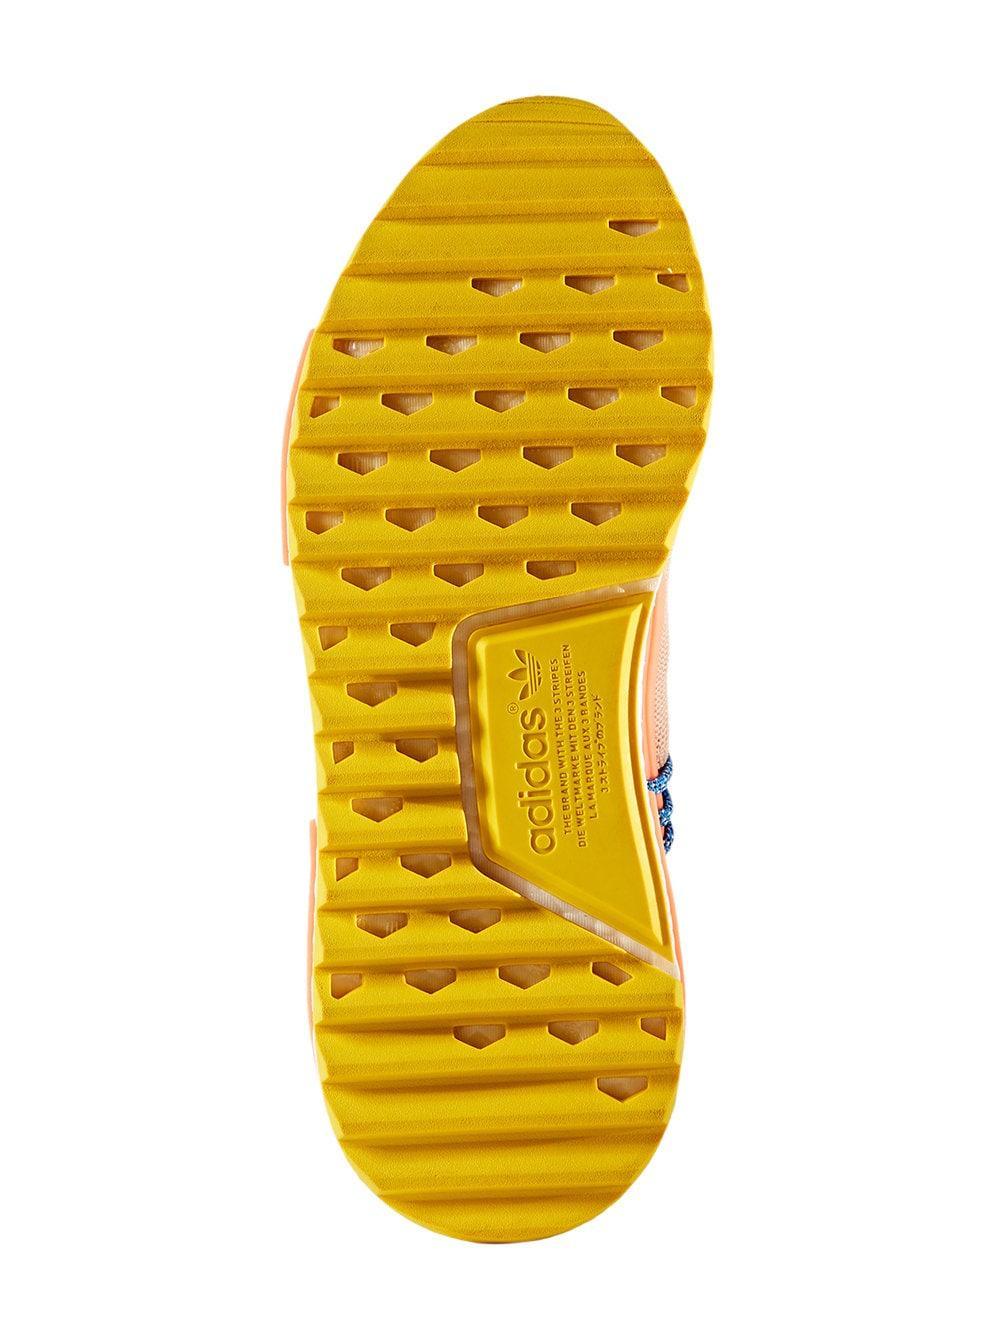 0d015ef20a9f3 Lyst - adidas X Pharrell Williams Human Race Nmd Breathe Walk ...